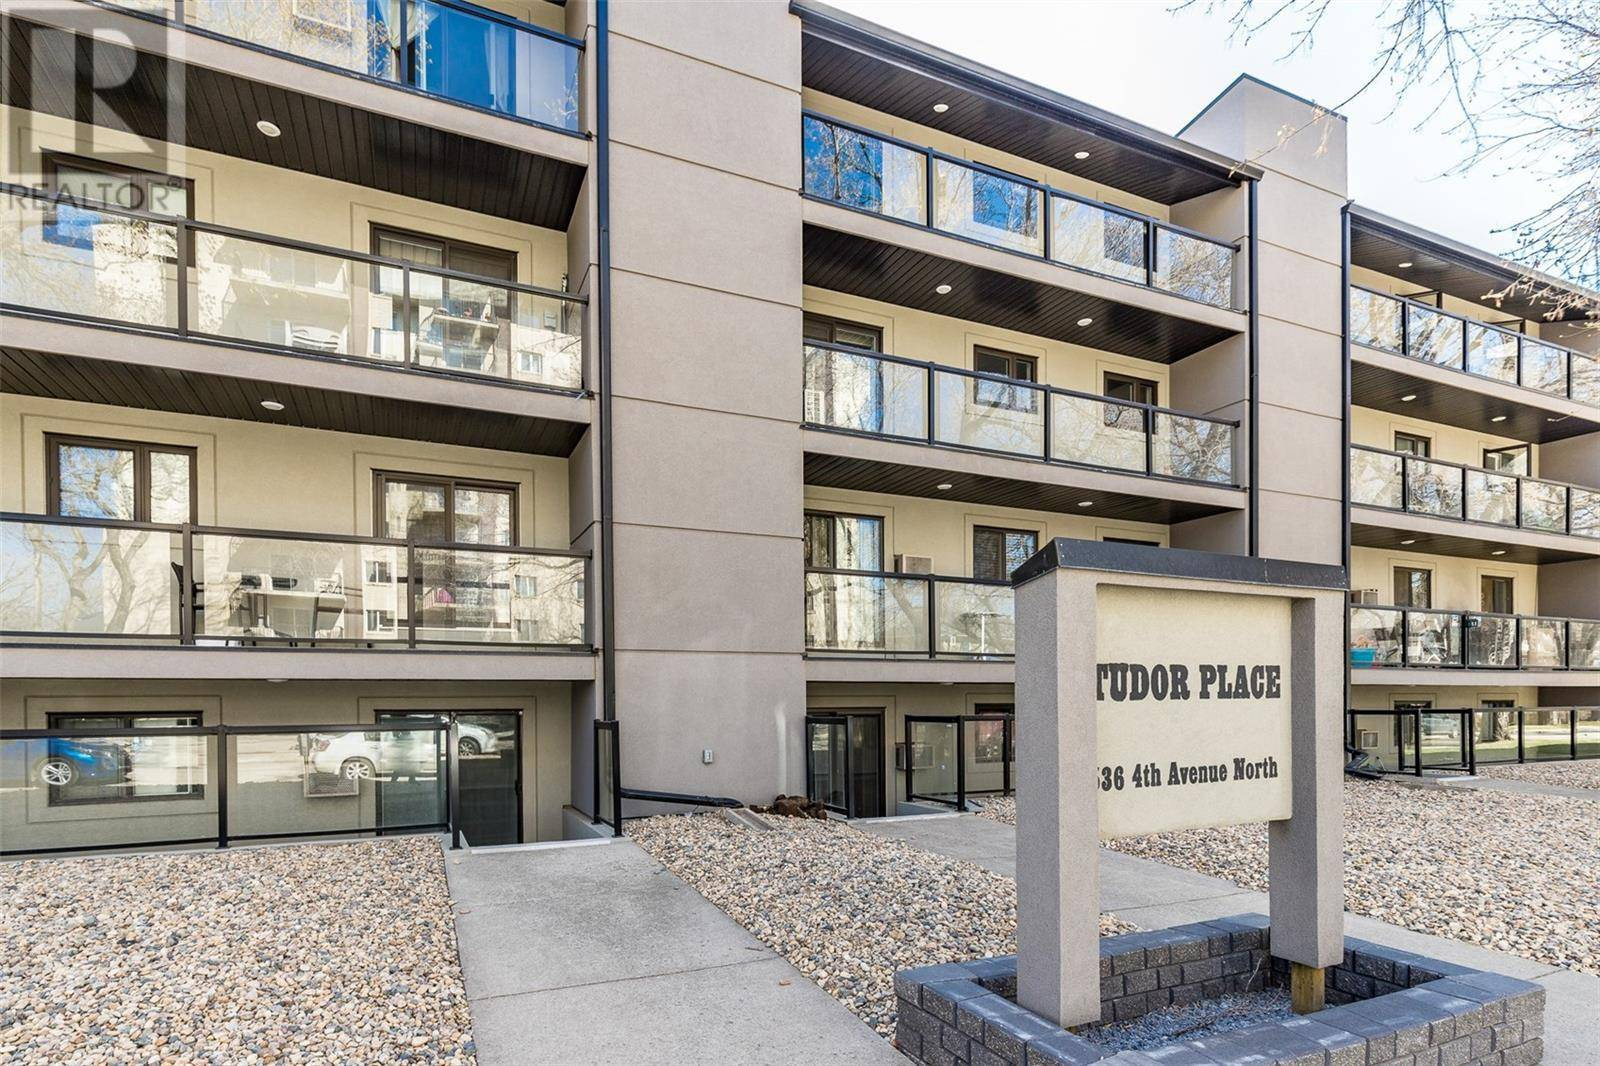 Condo for sale at 536 4th Ave N Unit 402 Saskatoon Saskatchewan - MLS: SK790737